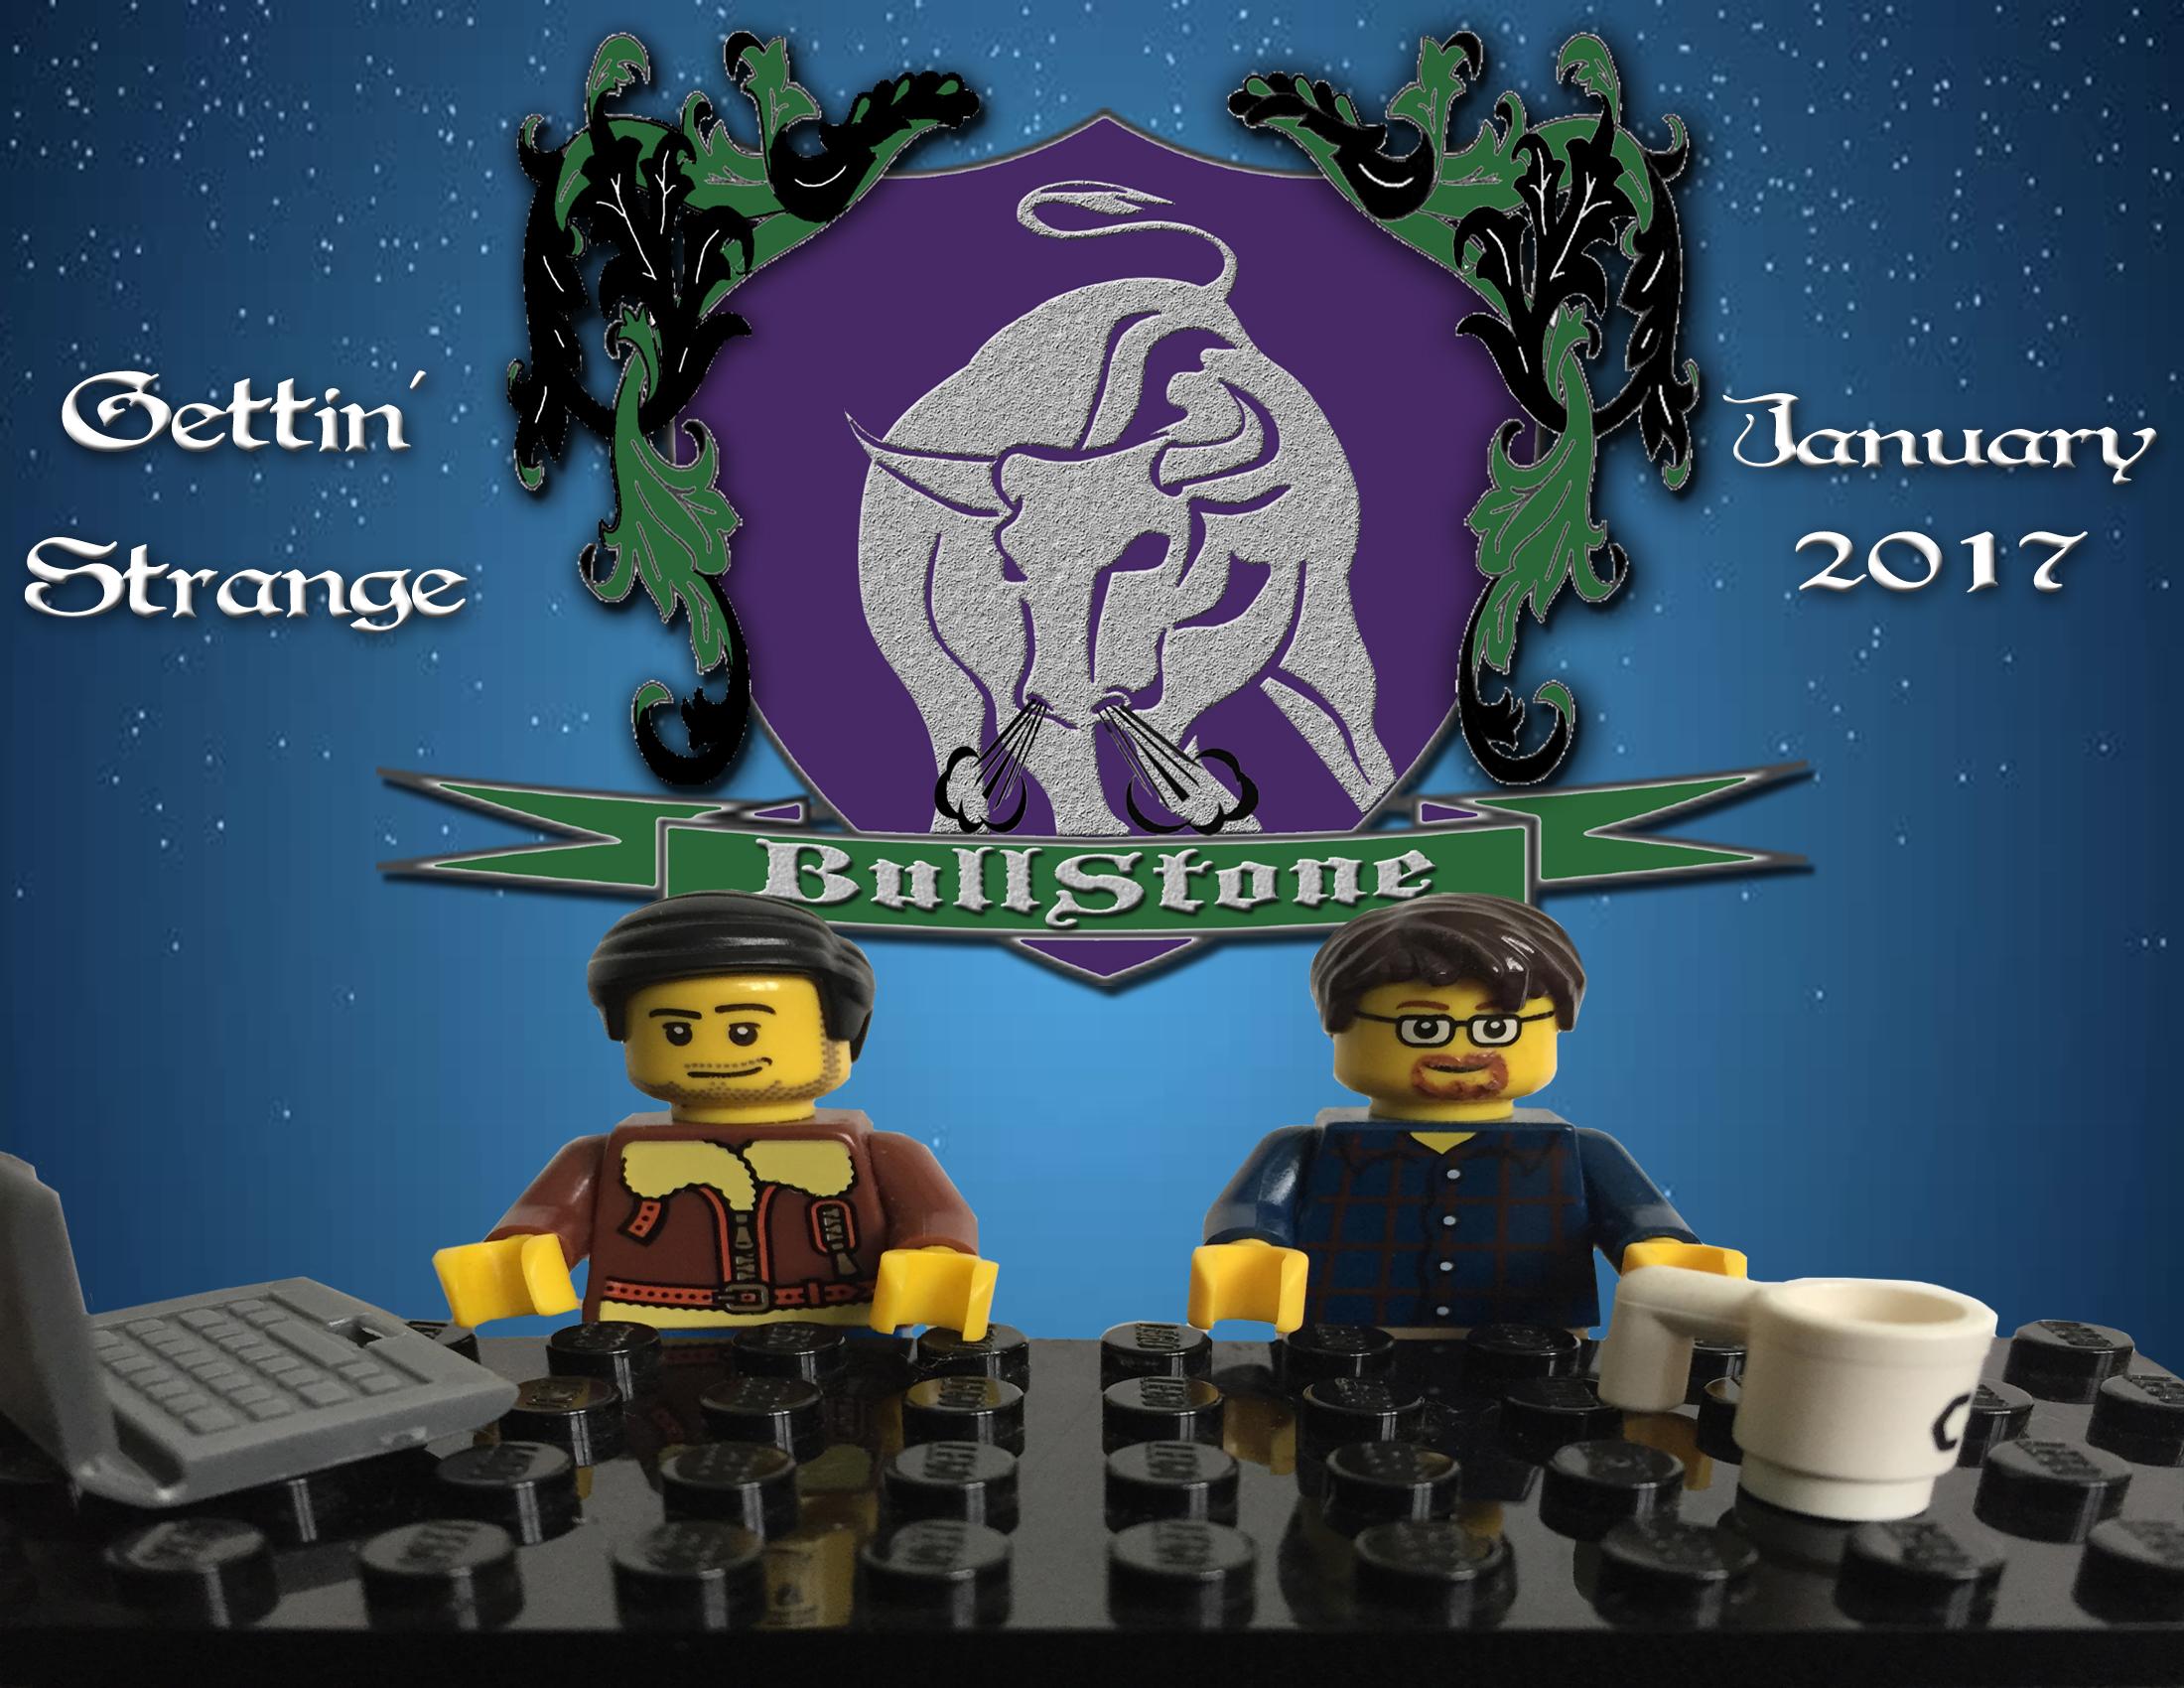 BullStone 24: Greg Bach, January 2017